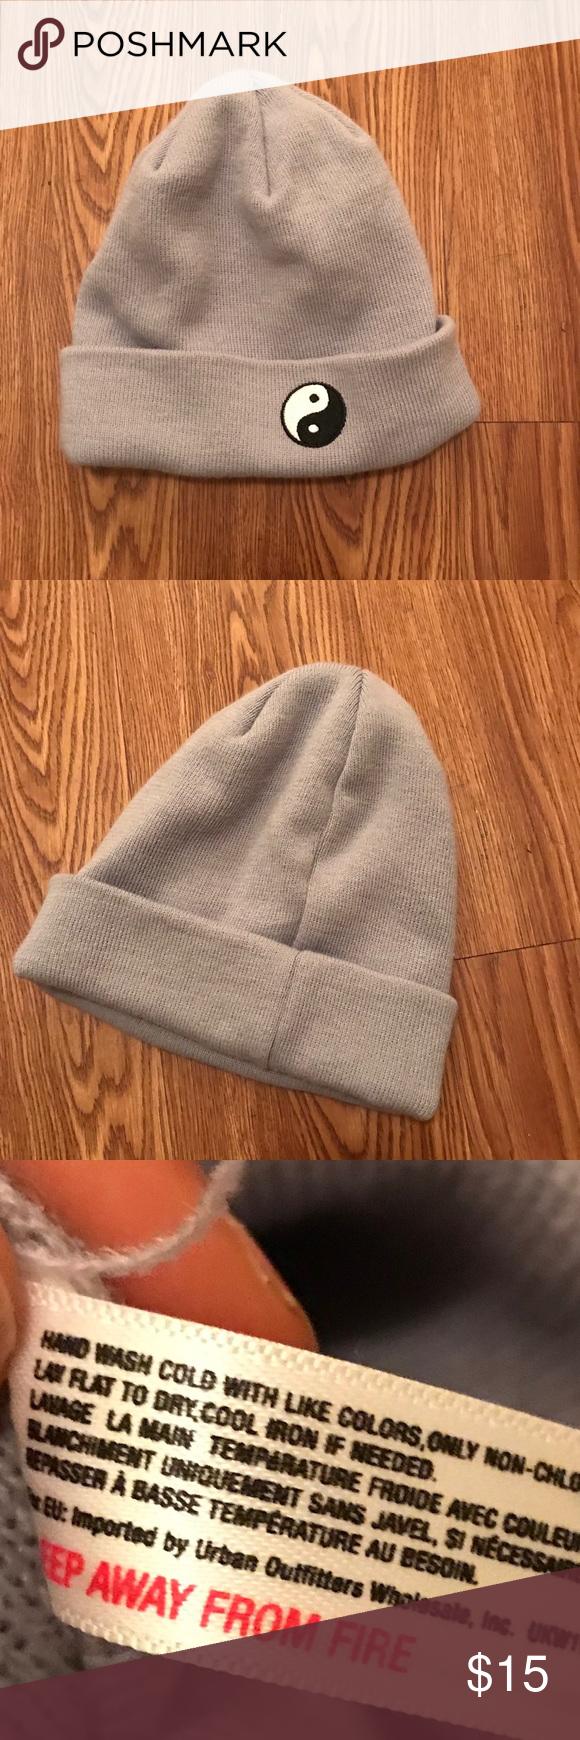 Urban Outfitters Yin Yang Beanie Hat Beanie Hats Urban Outfitters Yin Yang